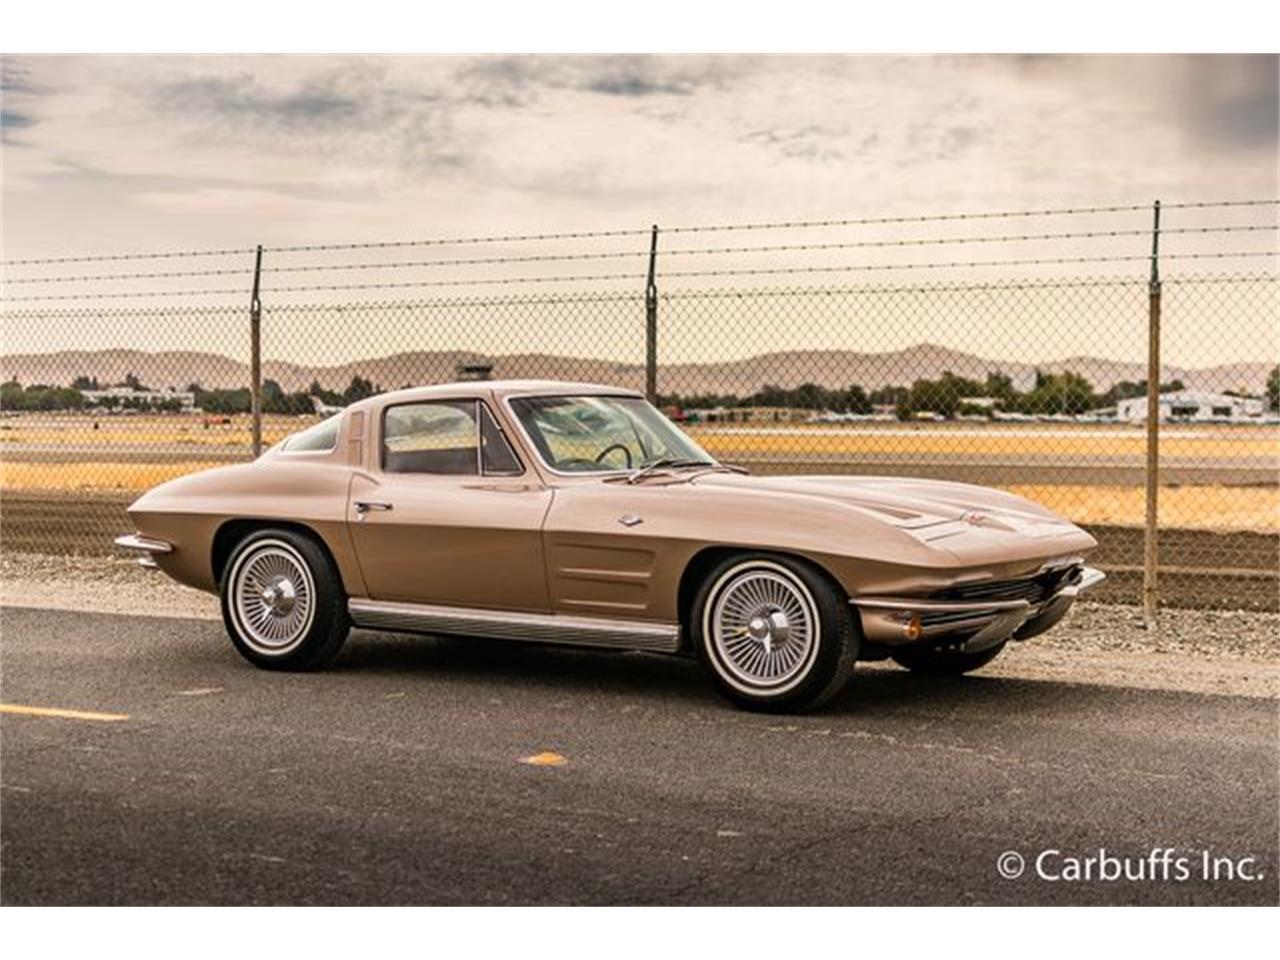 Large Picture of Classic '64 Chevrolet Corvette located in California - LSQ2